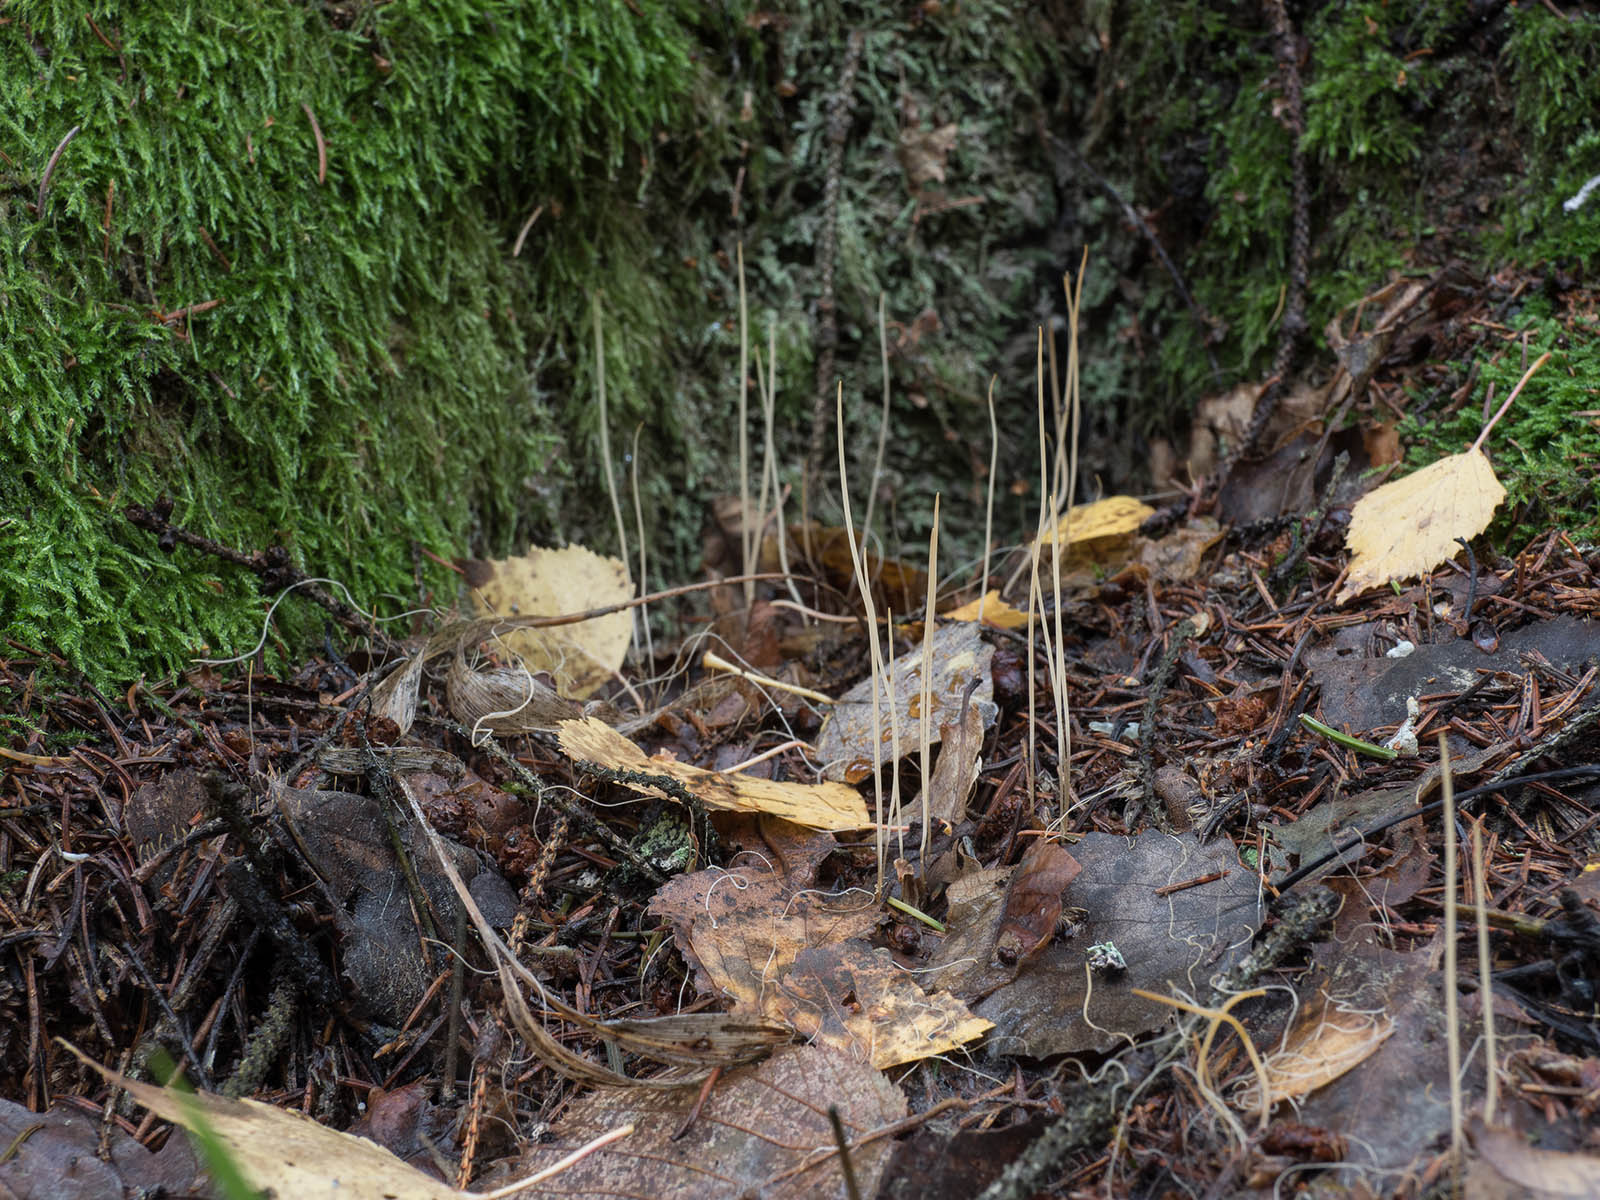 Typhula juncea (синонимы: Macrotyphula juncea, Clavariadelphus junceus) растущие на лиственном опаде в природном парке Görvälns naturreservat, октябрь 2019 года. Автор фото: Сутормина Марина